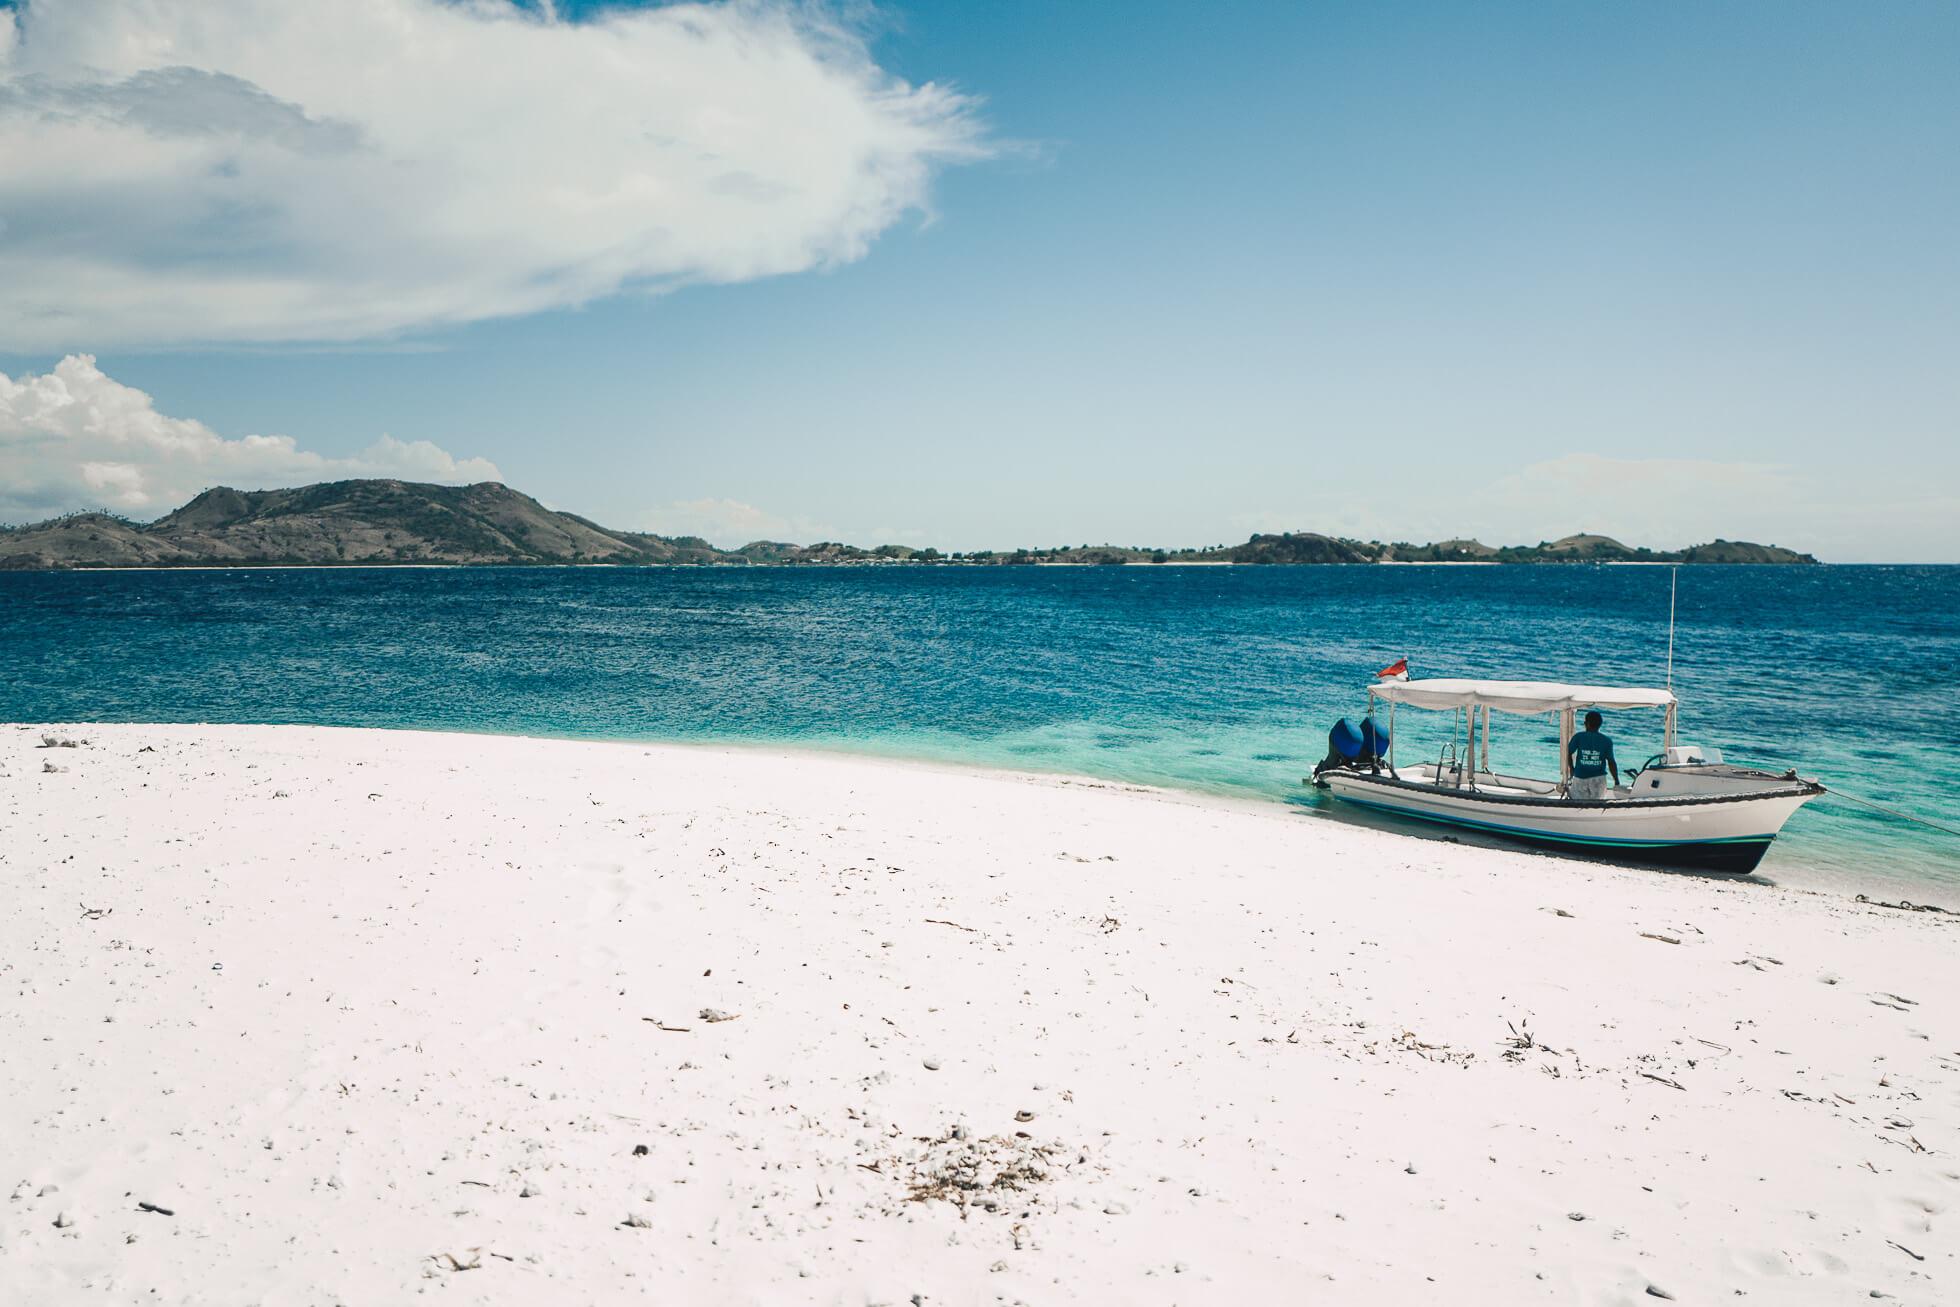 janni-deler-sea-shell-beachl1020850